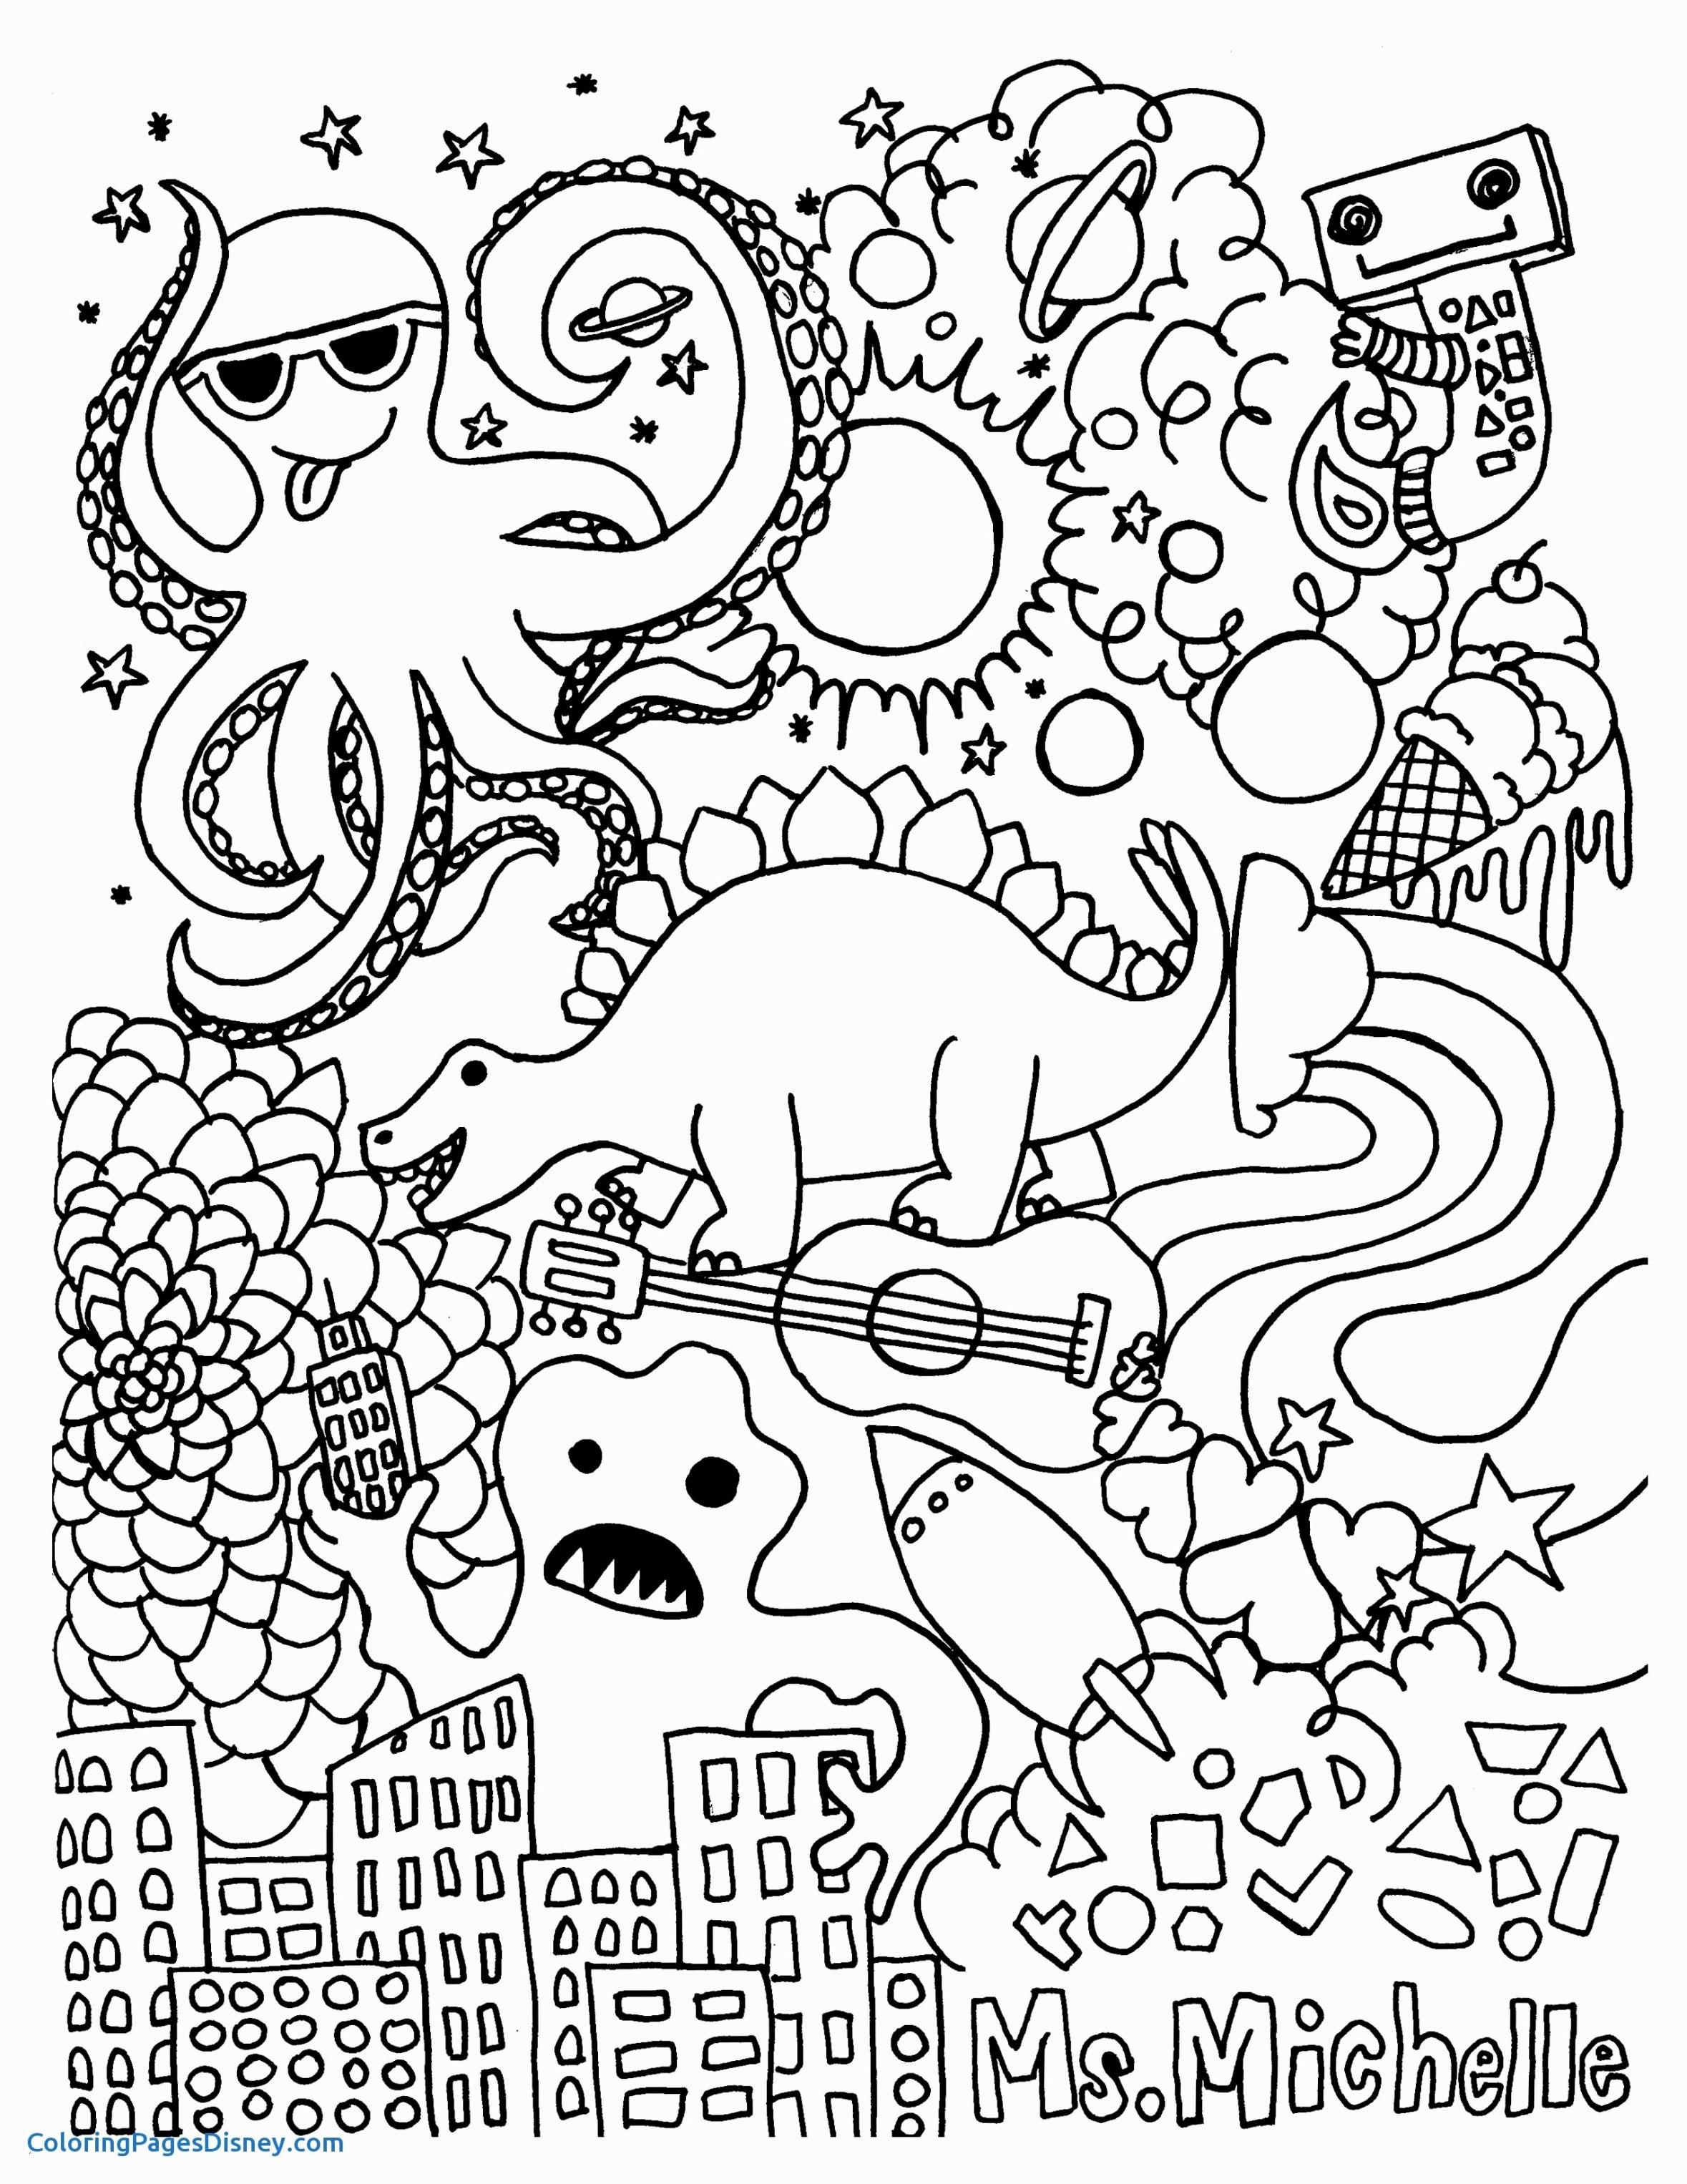 Clash Royal Ausmalbilder Neu Dessin De Clash Clans Génial 40 Malvorlagen Trolls Scoredatscore Galerie